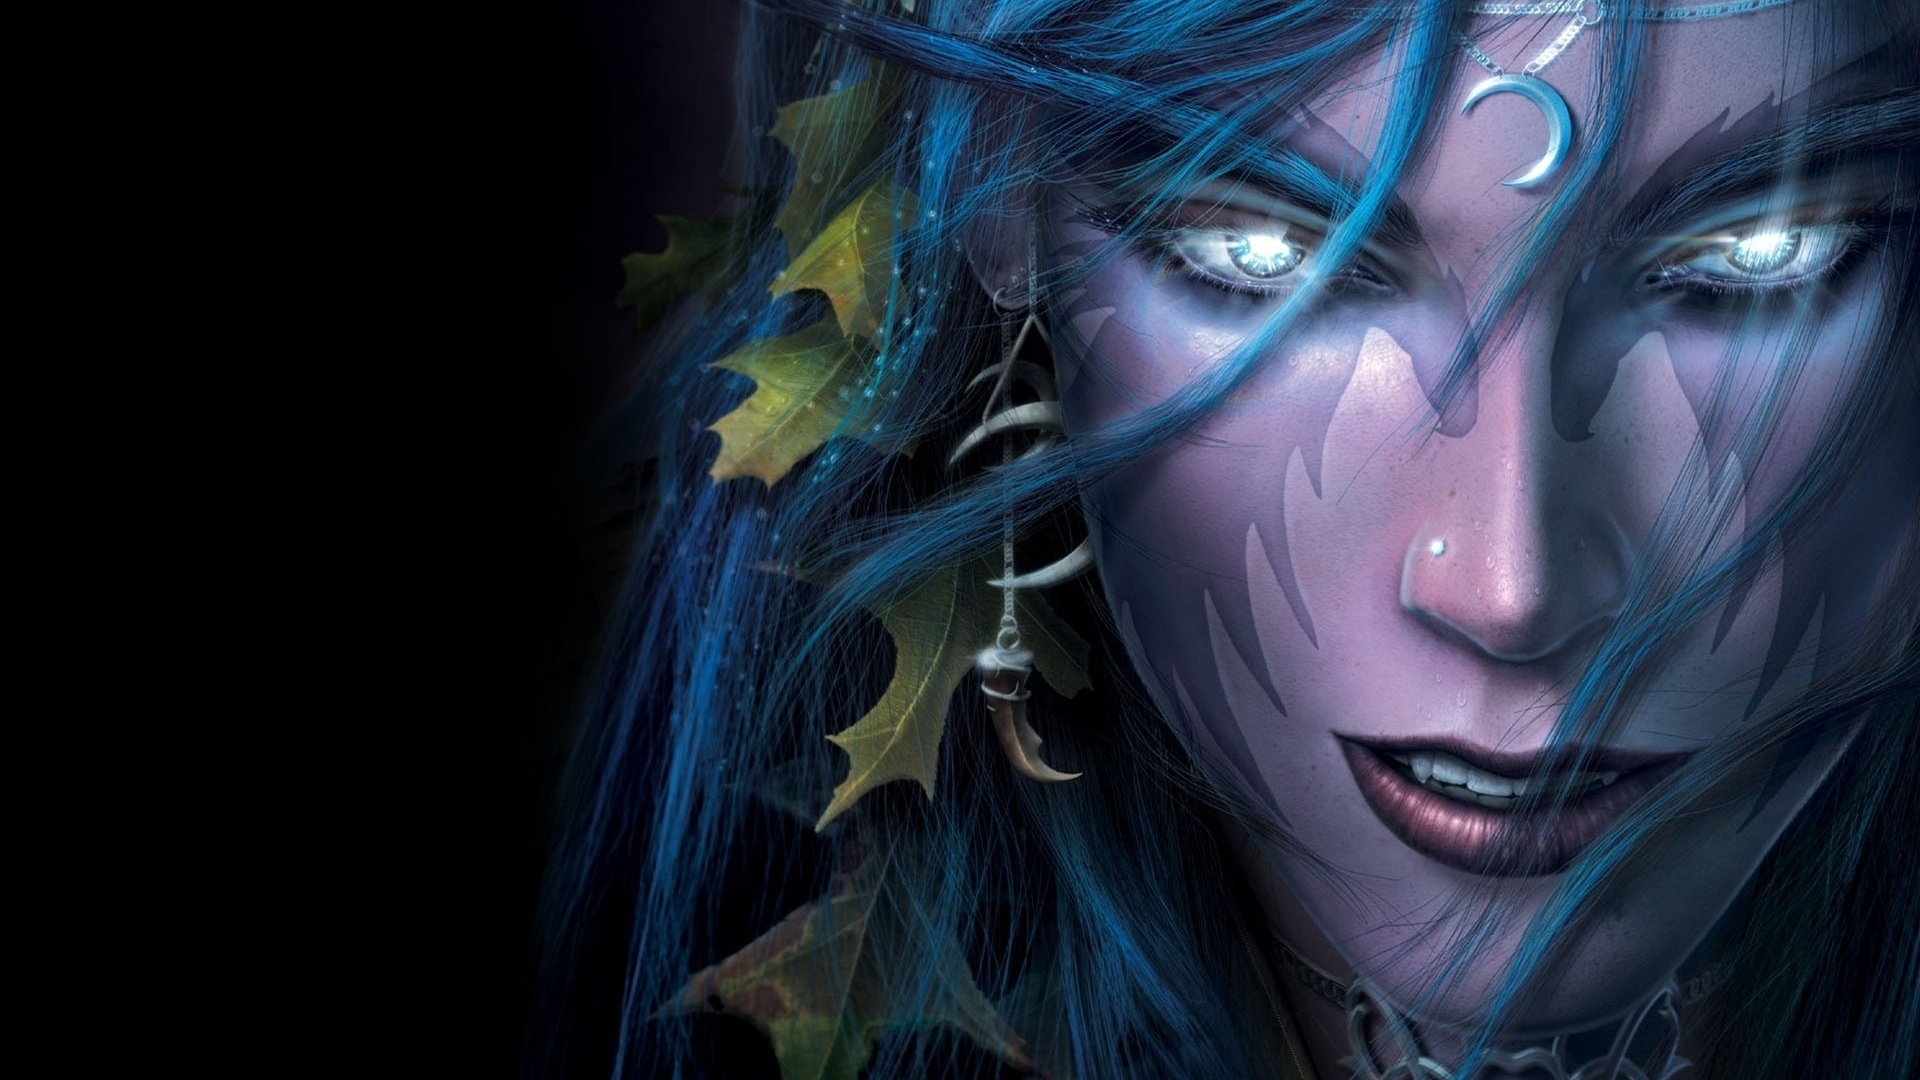 Warcraft 3 wallpaper 4